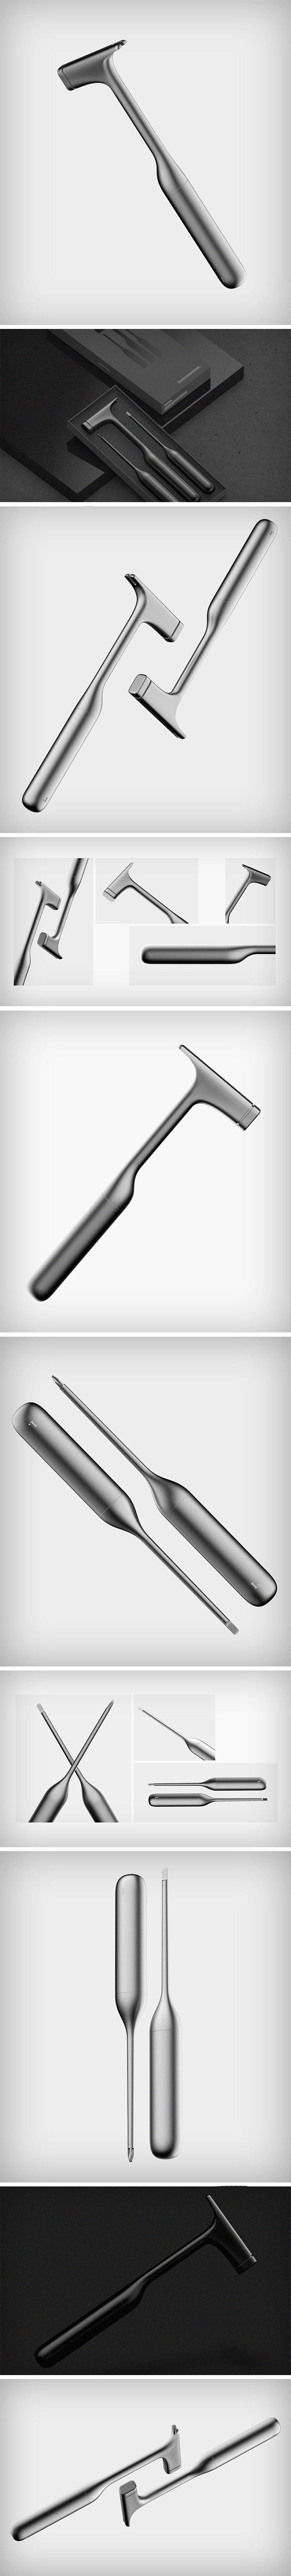 970 best Design 3D images on Pinterest